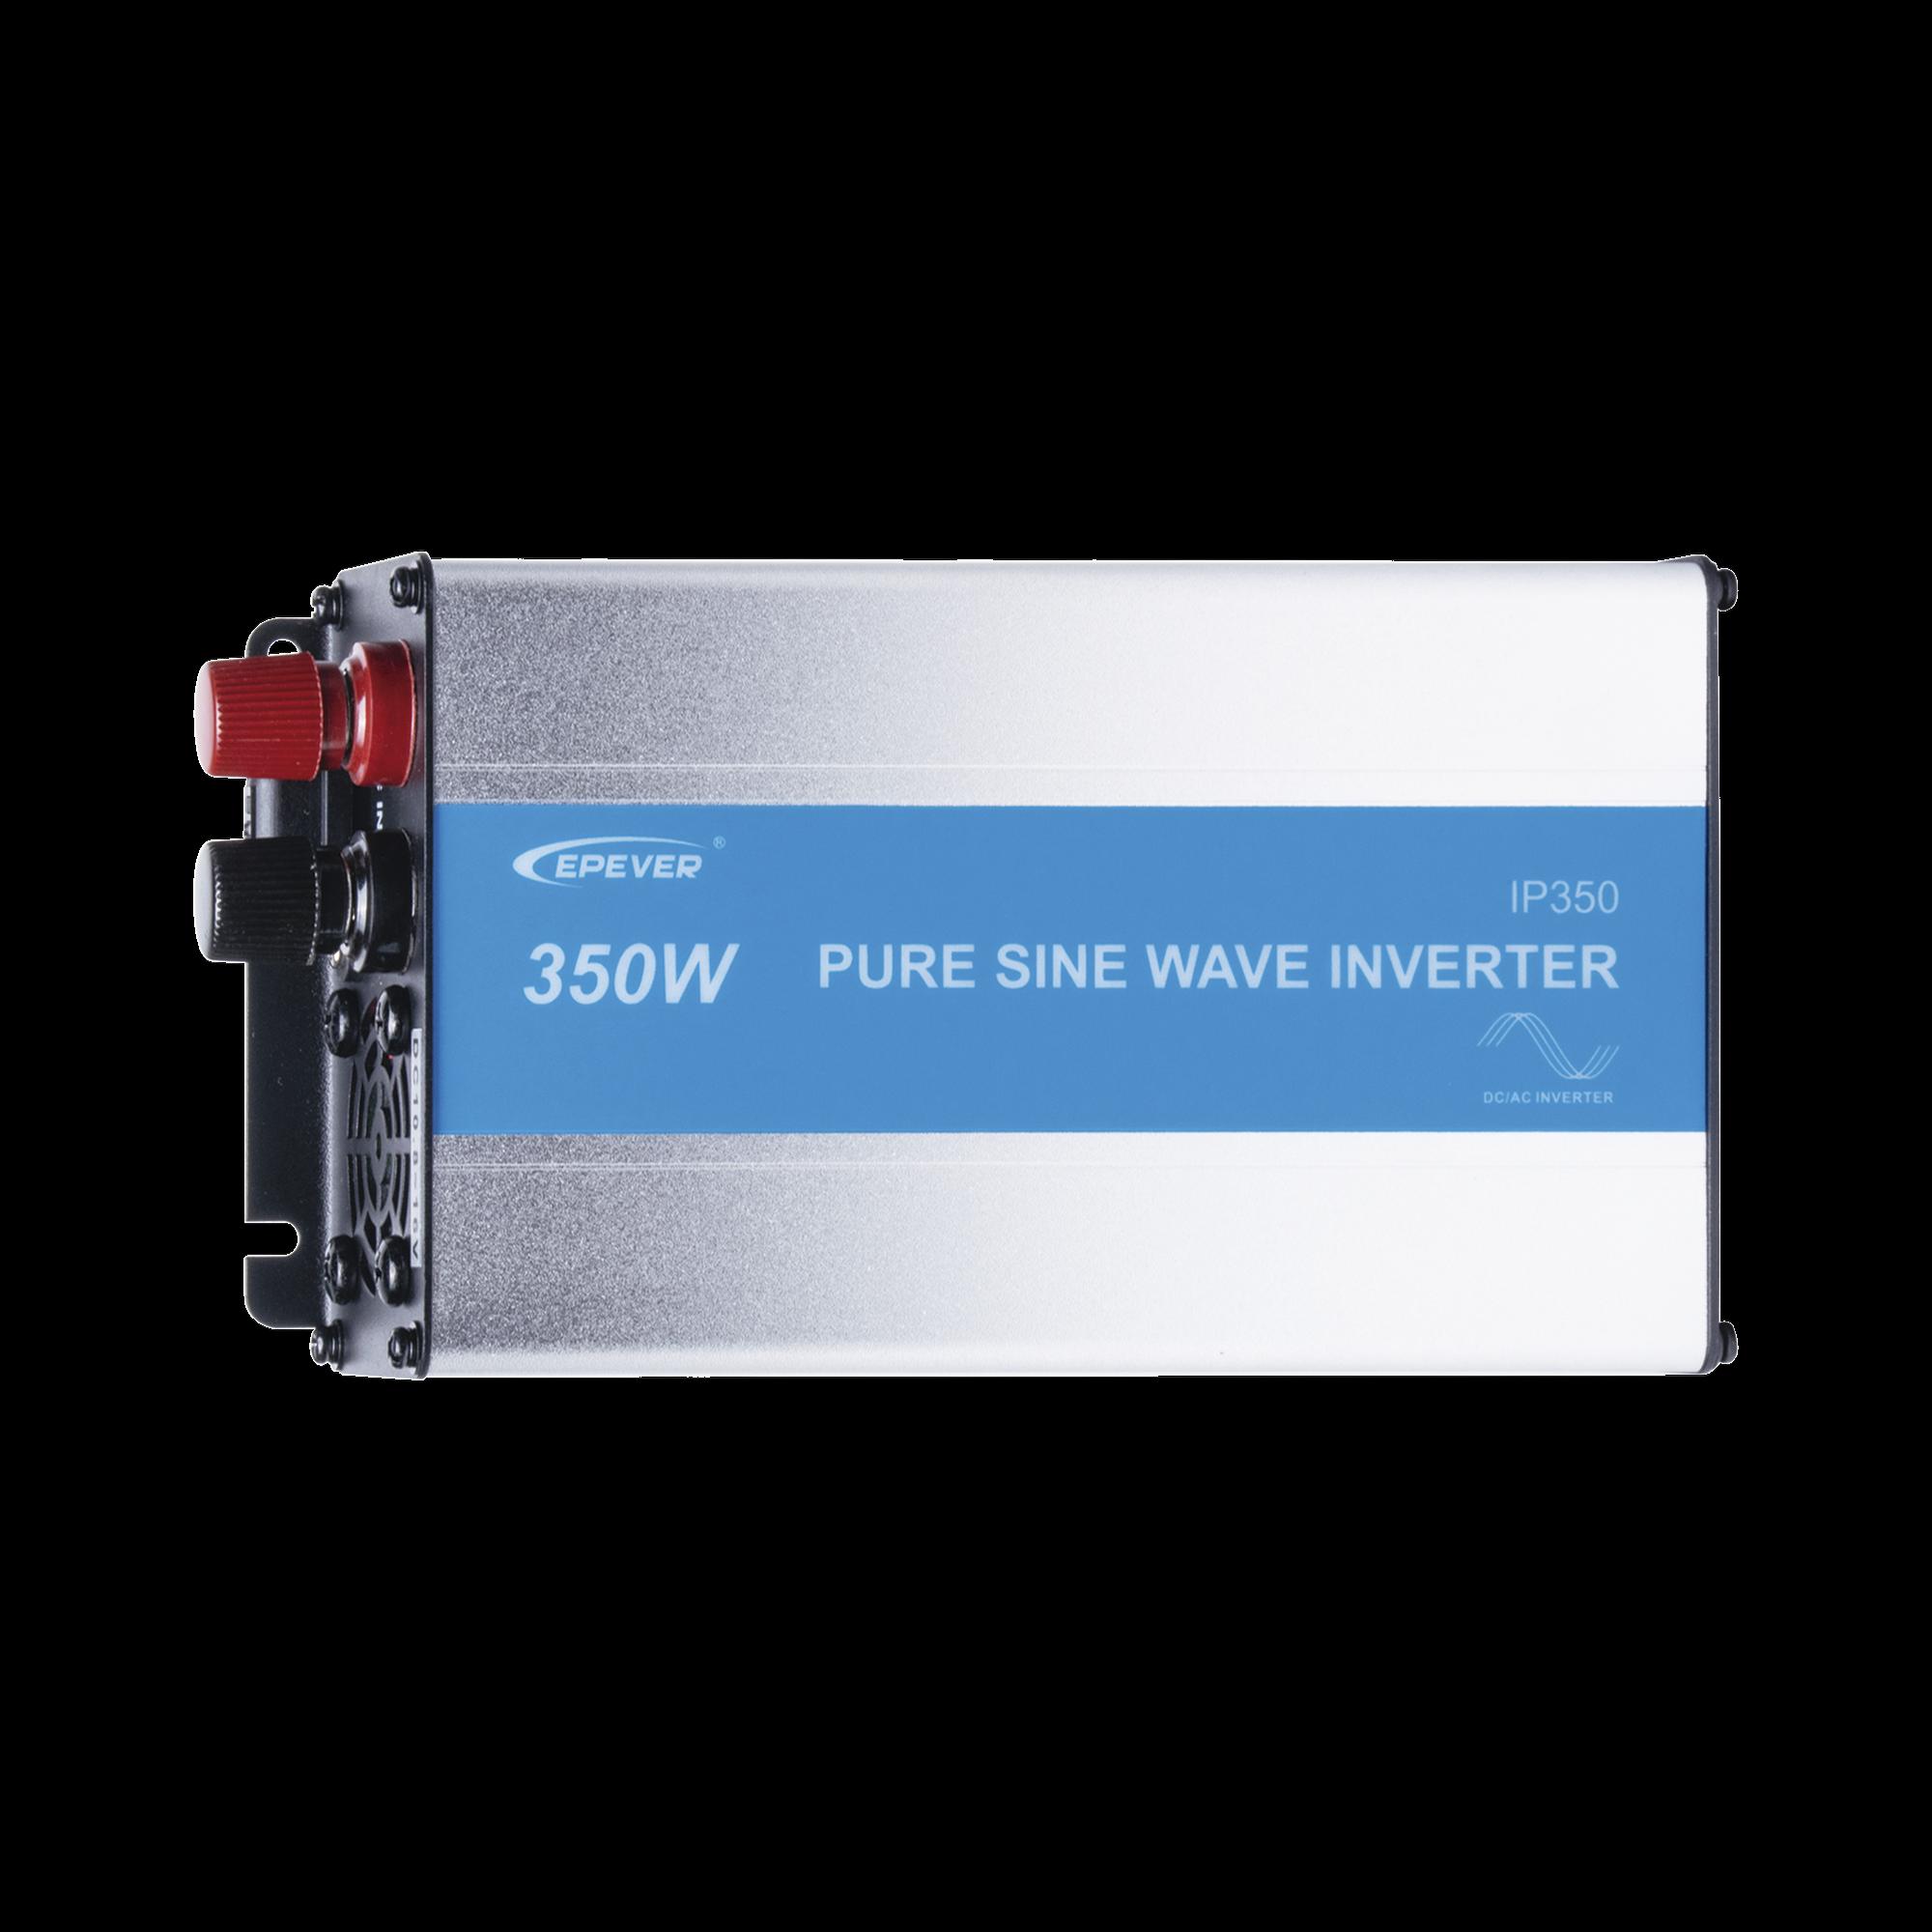 Inversor Ipower 280 W, Ent: 12V, Salida: 120 Vca